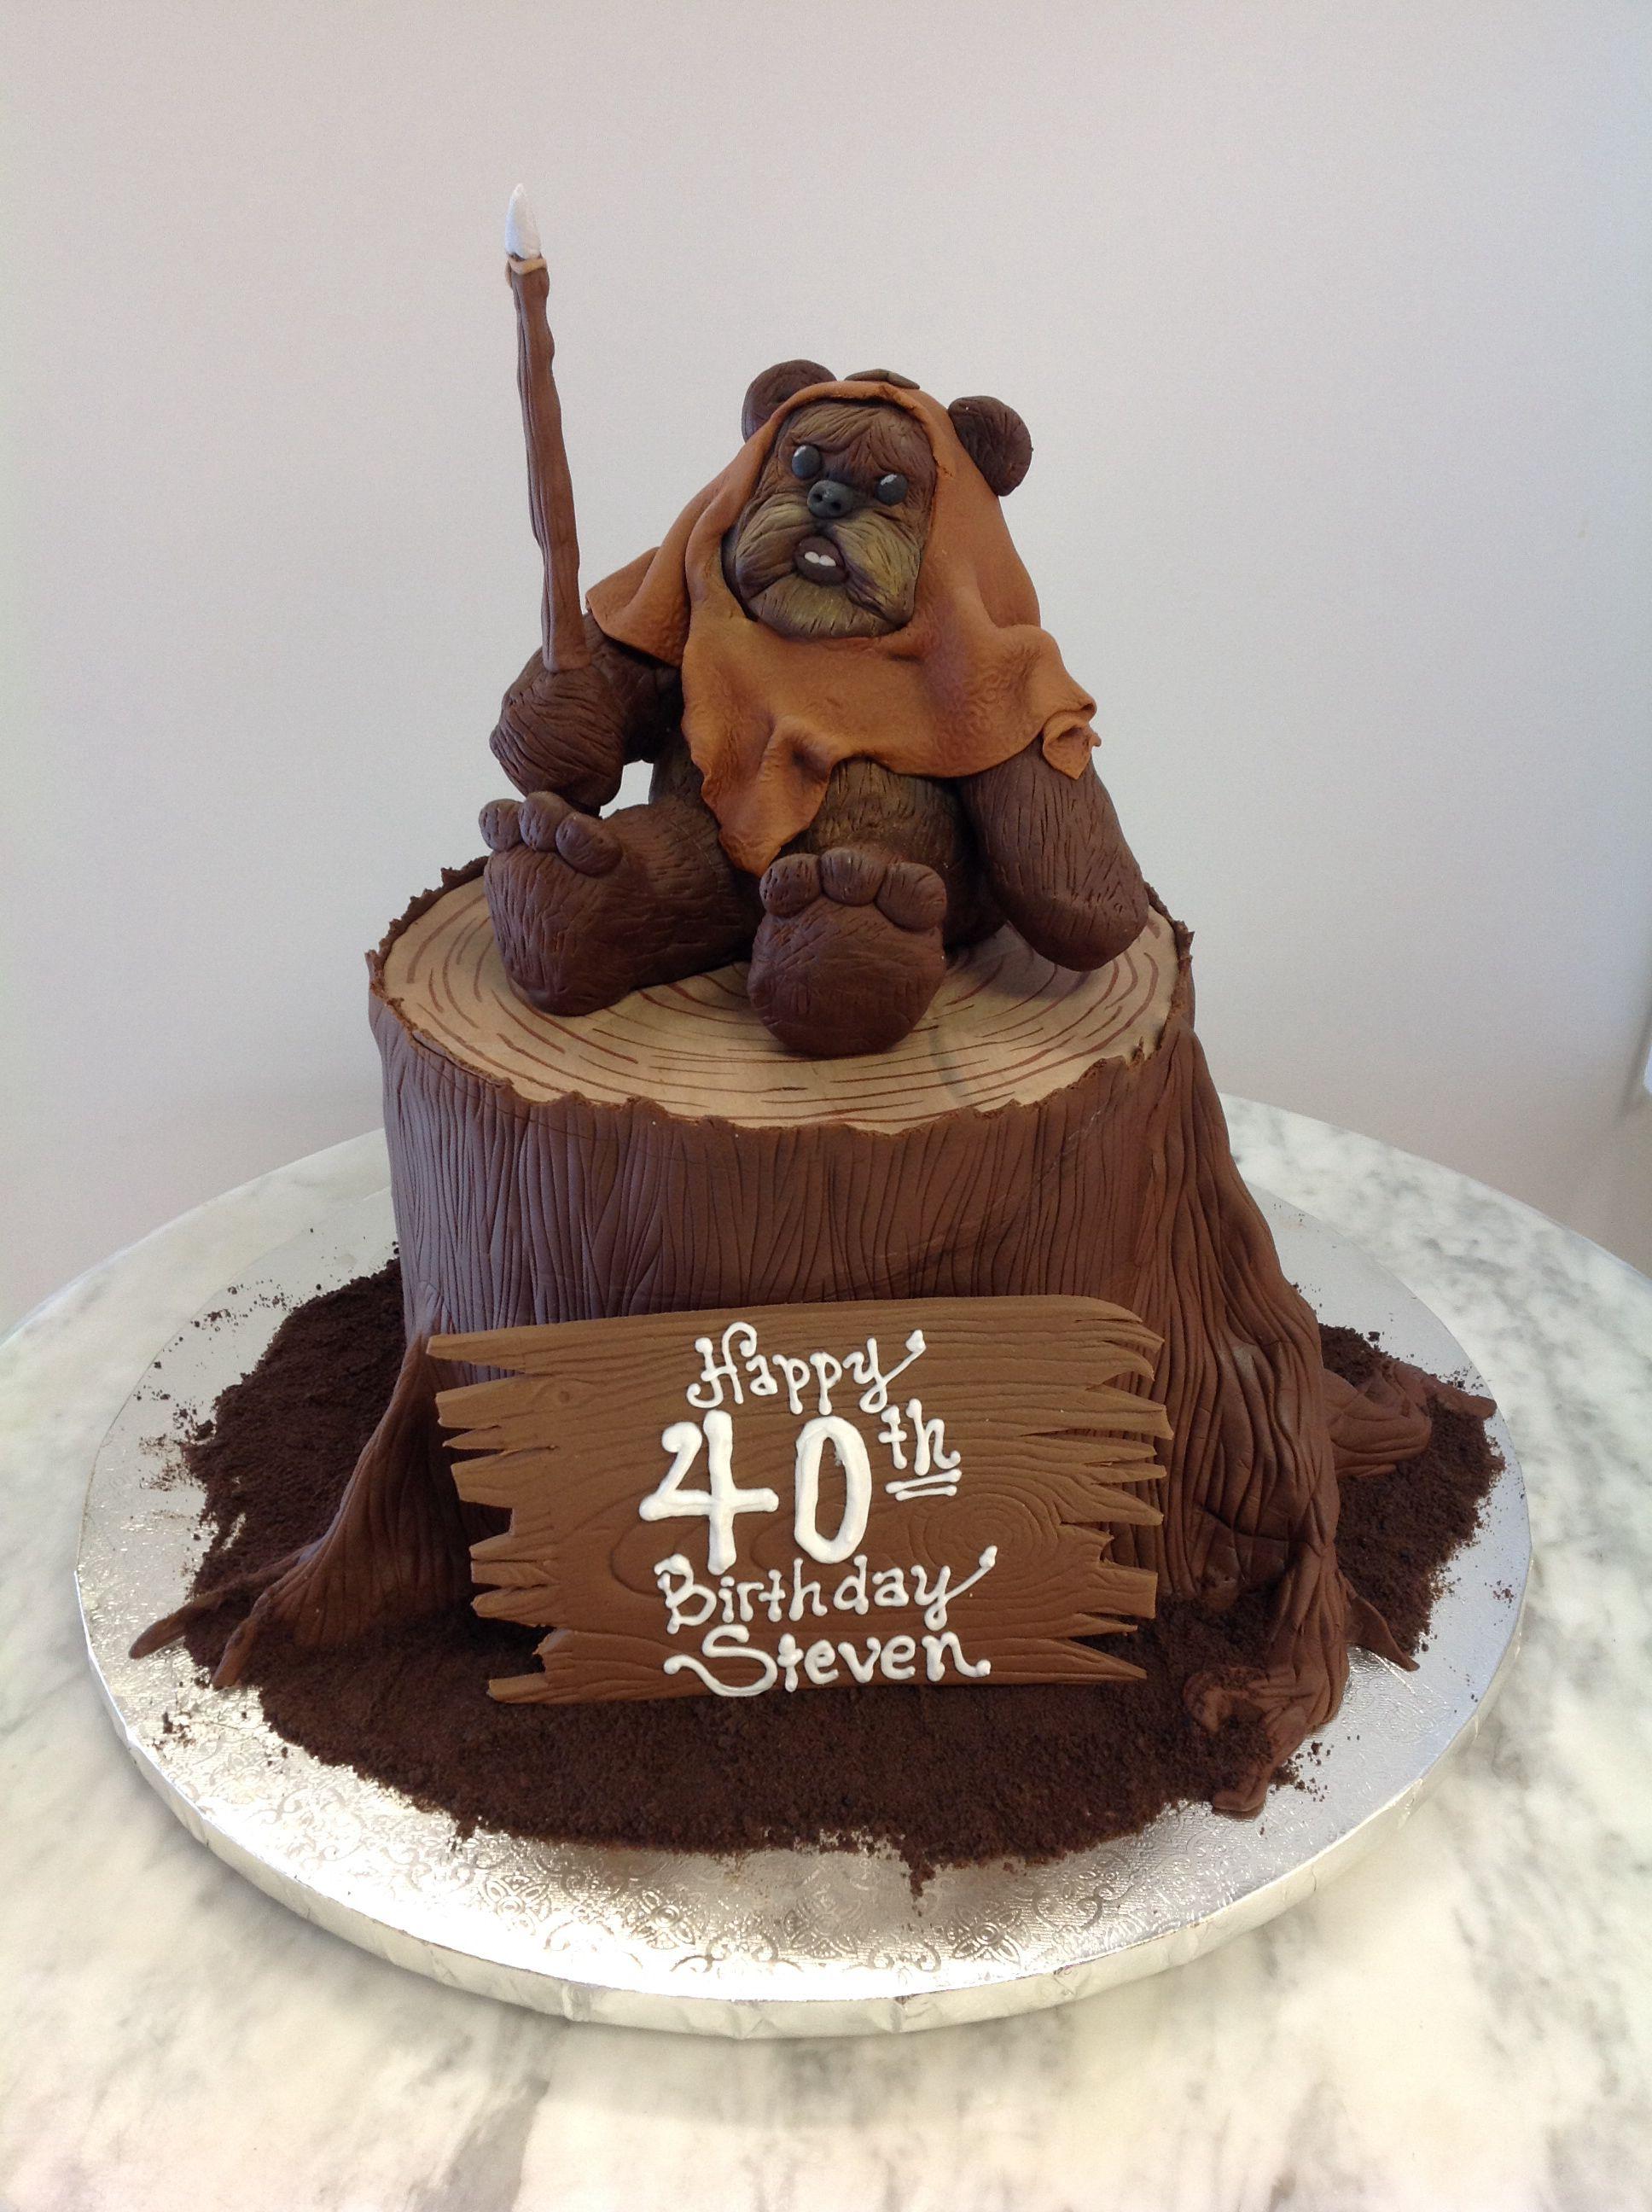 Star Wars Ewok cake!